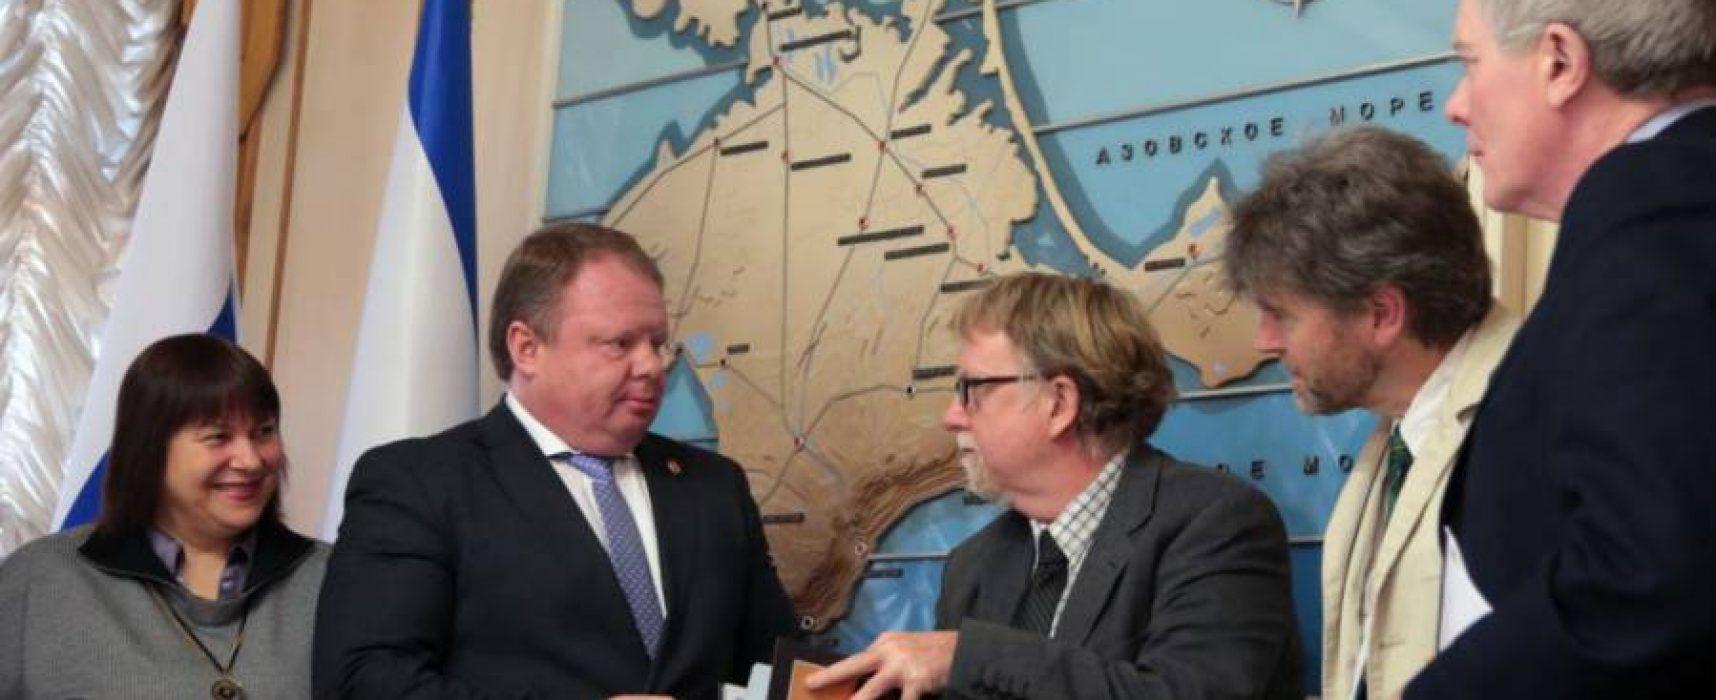 UK university denies any part in Russia's latest Crimea propaganda stunt